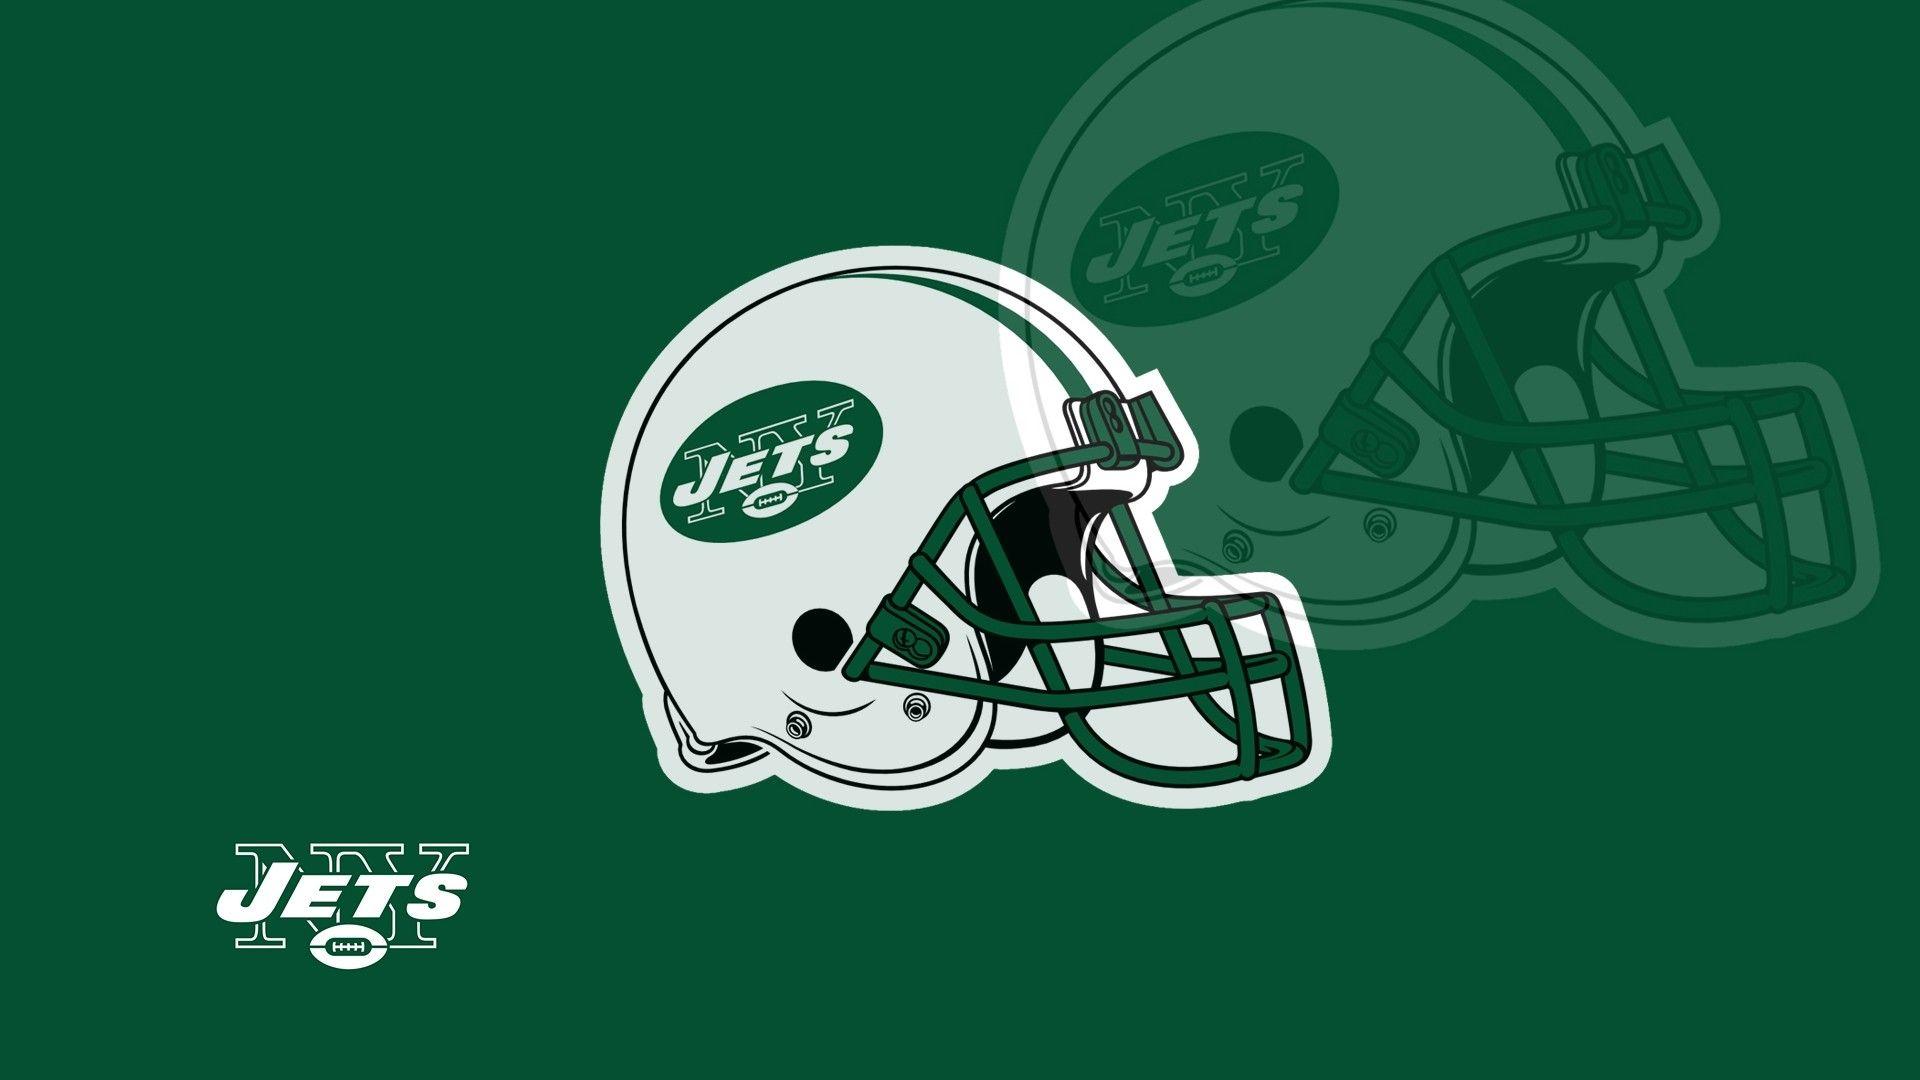 New York Jets Desktop Wallpaper New York Jets Nfl Football Wallpaper Best Wallpaper Hd